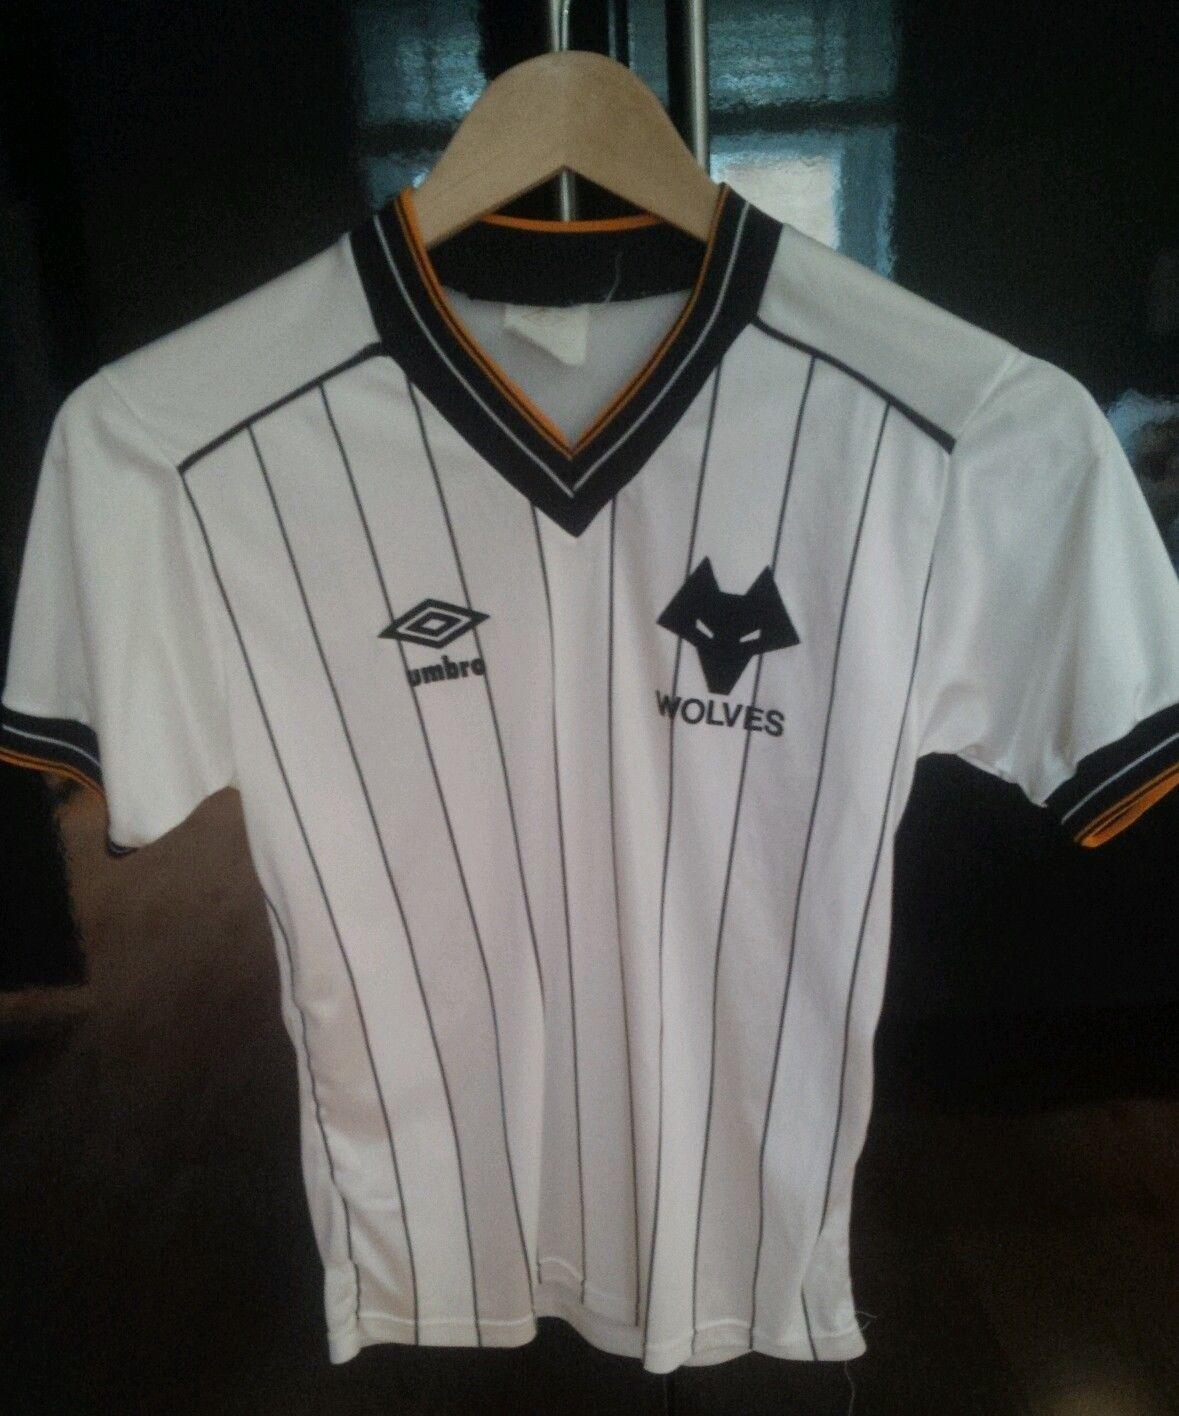 1982 Wolverhampton Wanderers shirt White pin stripe away  331f4afbf